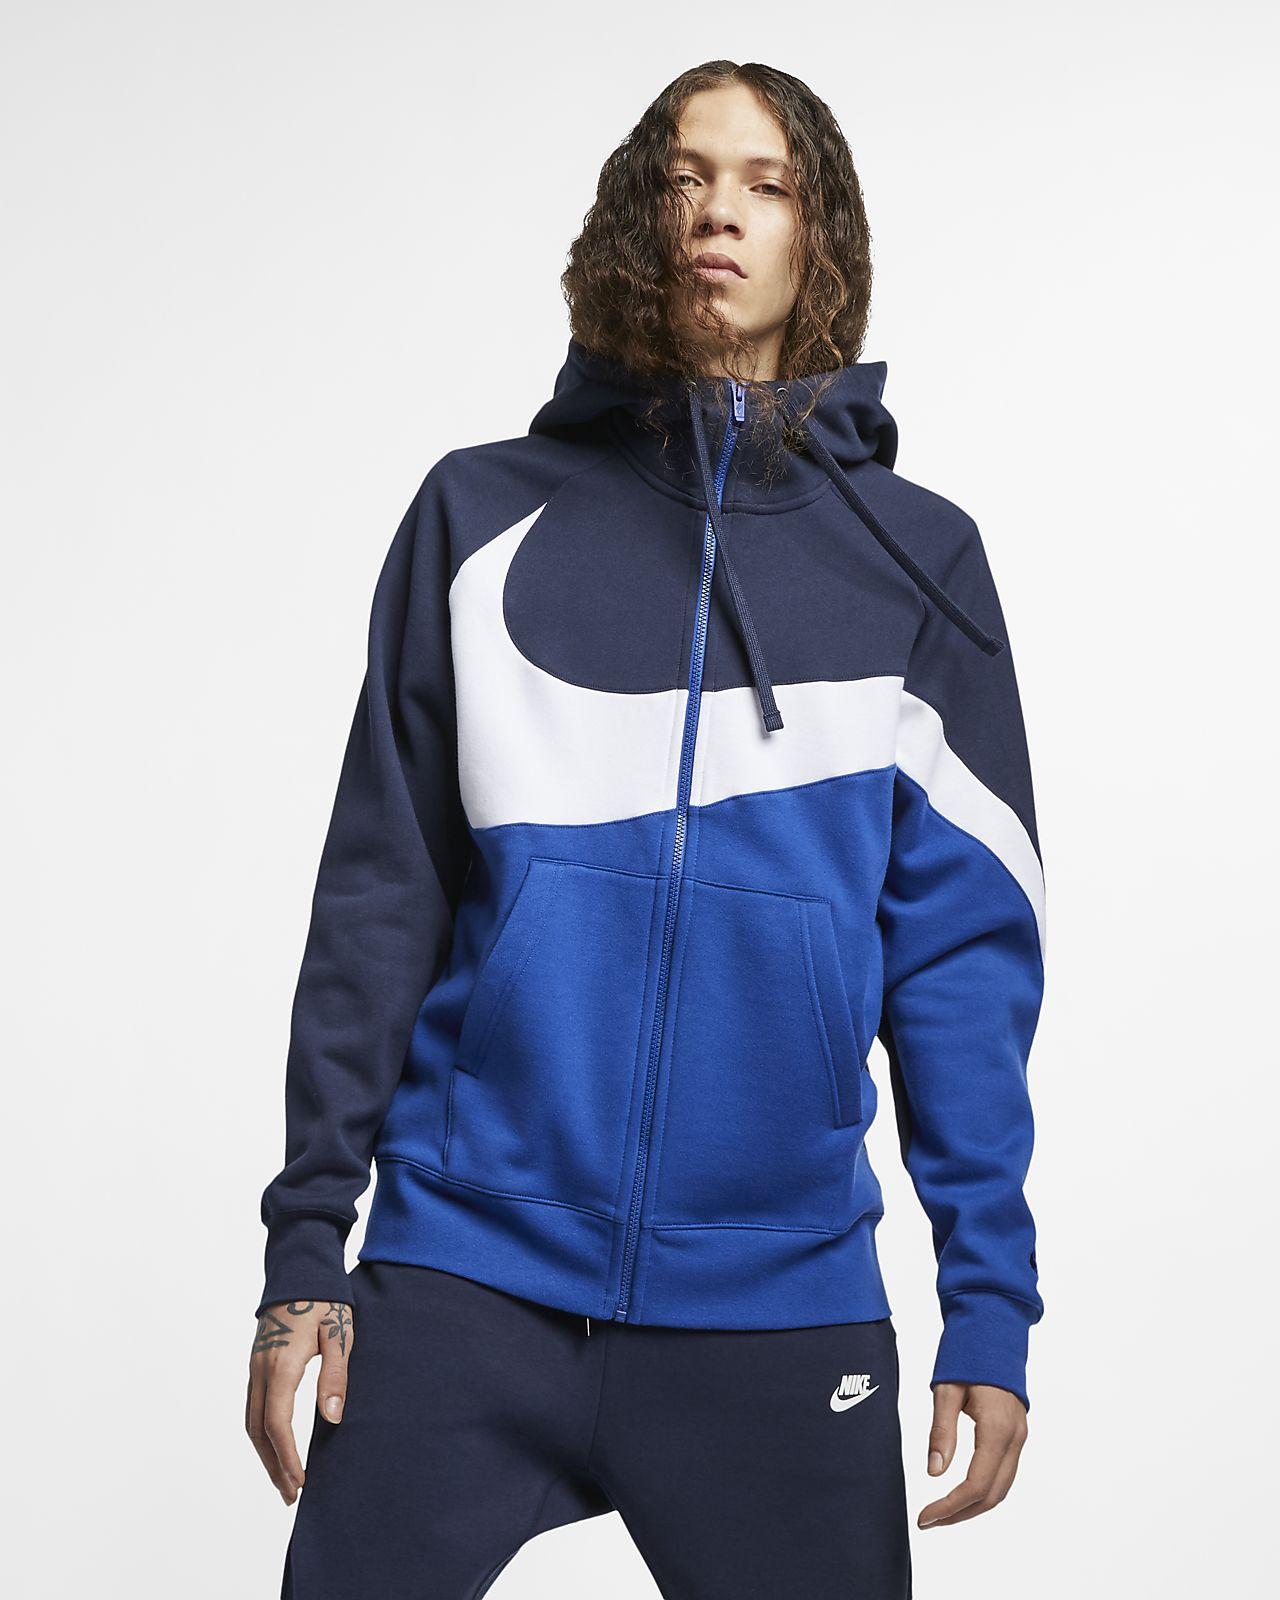 1e6814ed08a Ανδρική μπλούζα με κουκούλα και φερμουάρ Nike Sportswear. Nike.com GR